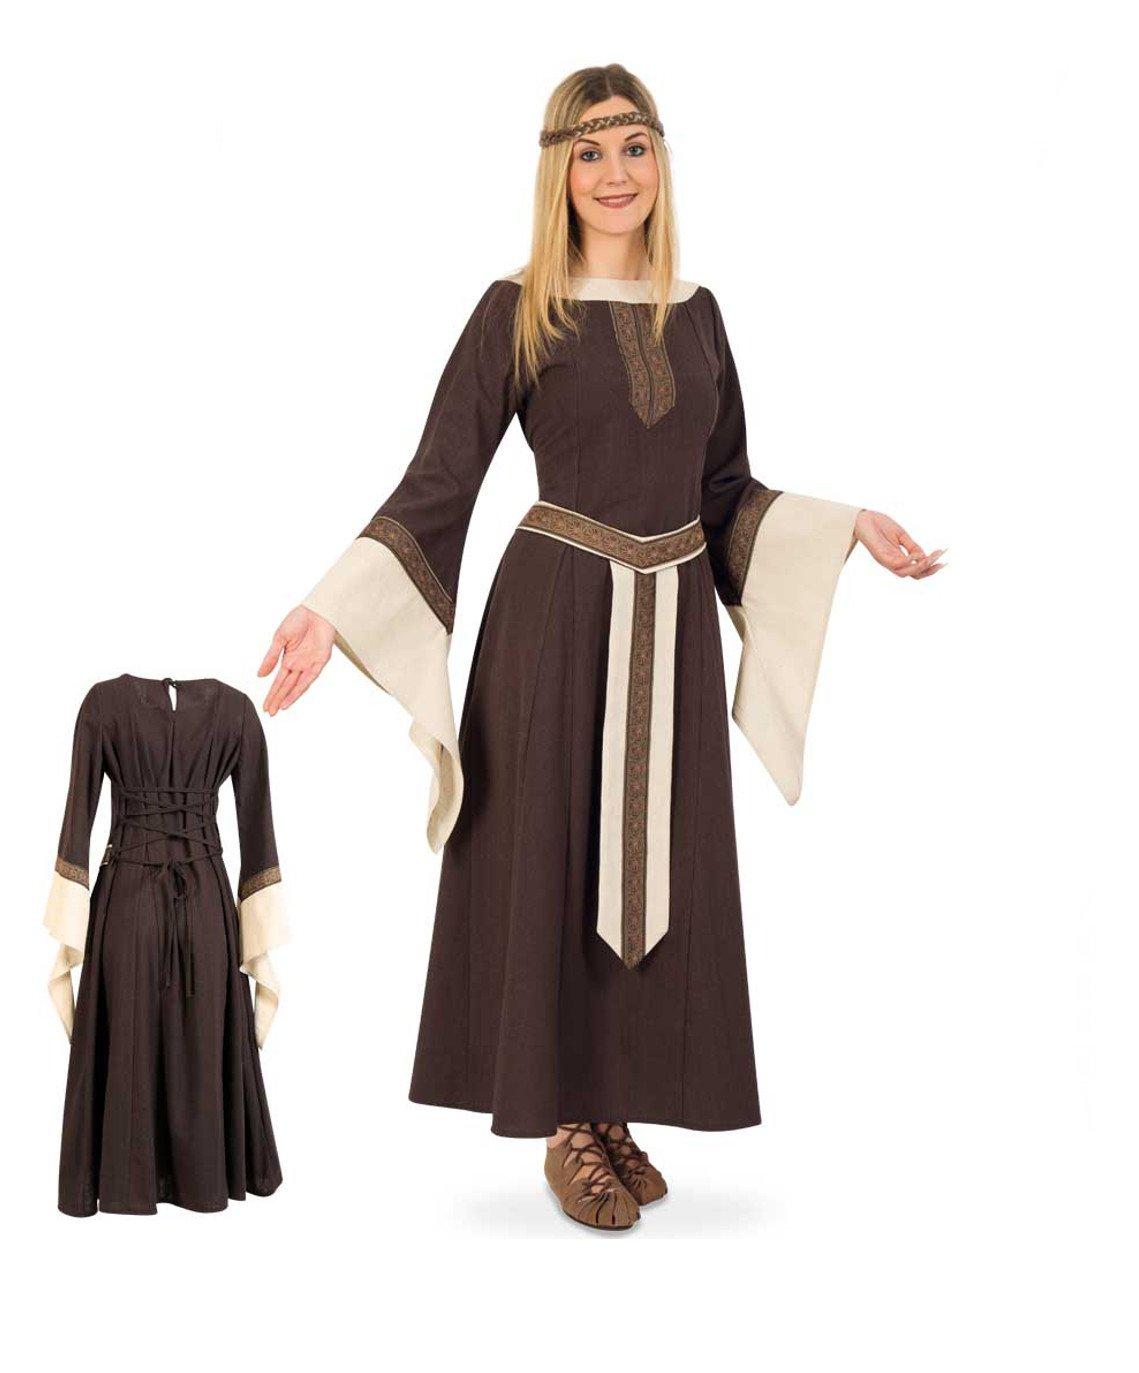 KarnevalsTeufel Edelfrau-Mittelalter braun beige langarmiges langes Kleid mit Gürtelblende (XL)